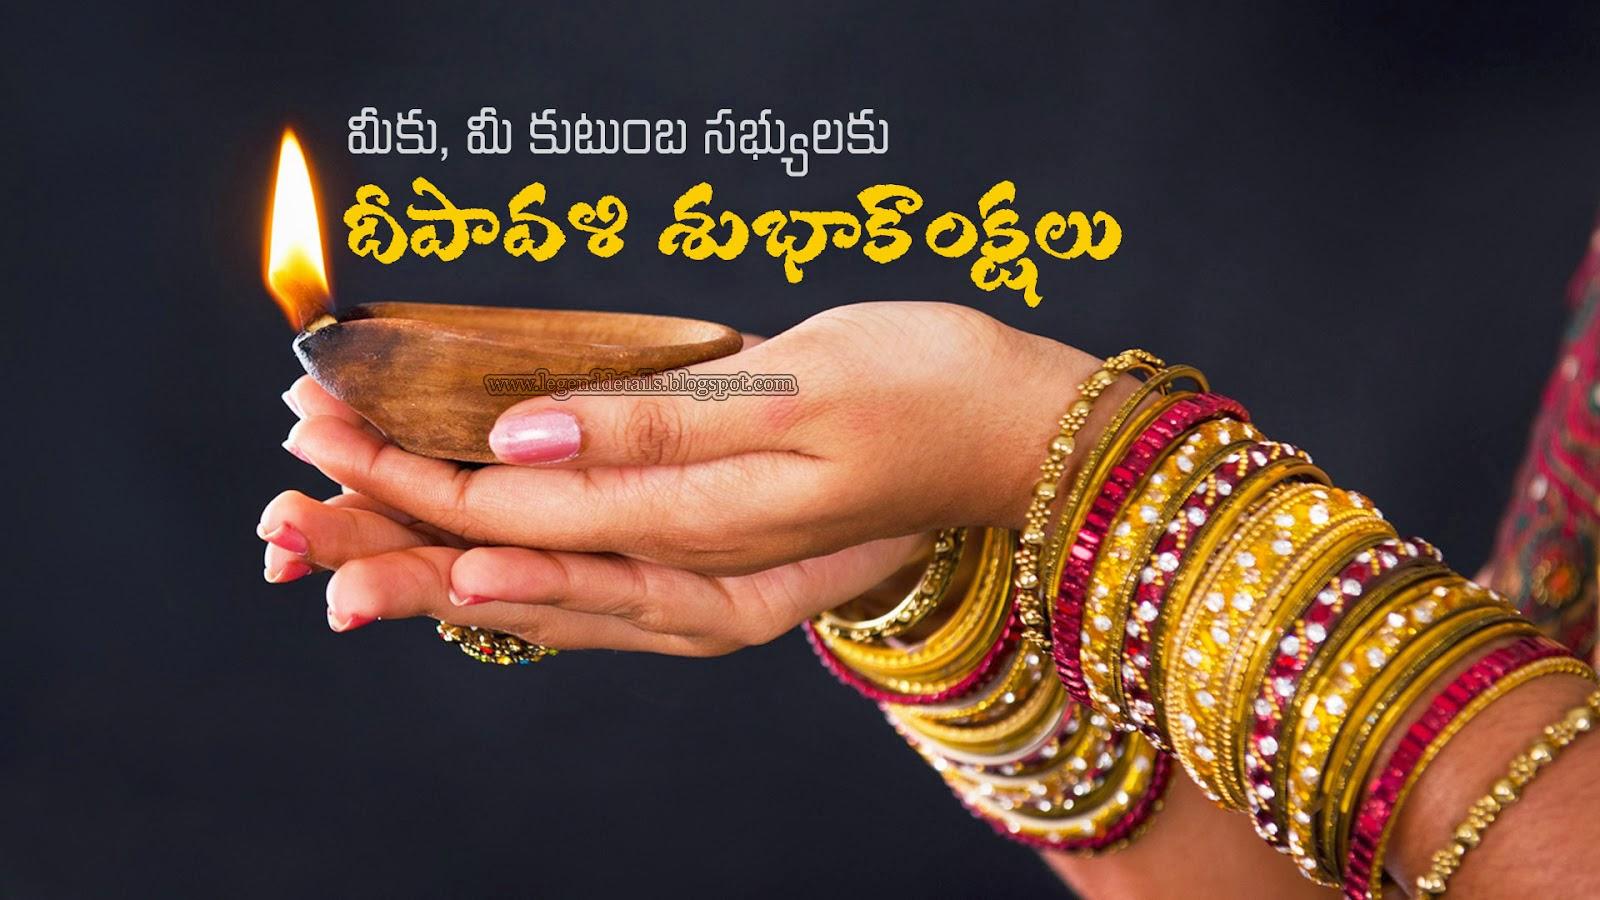 Diwali SMS Messages in Telugu